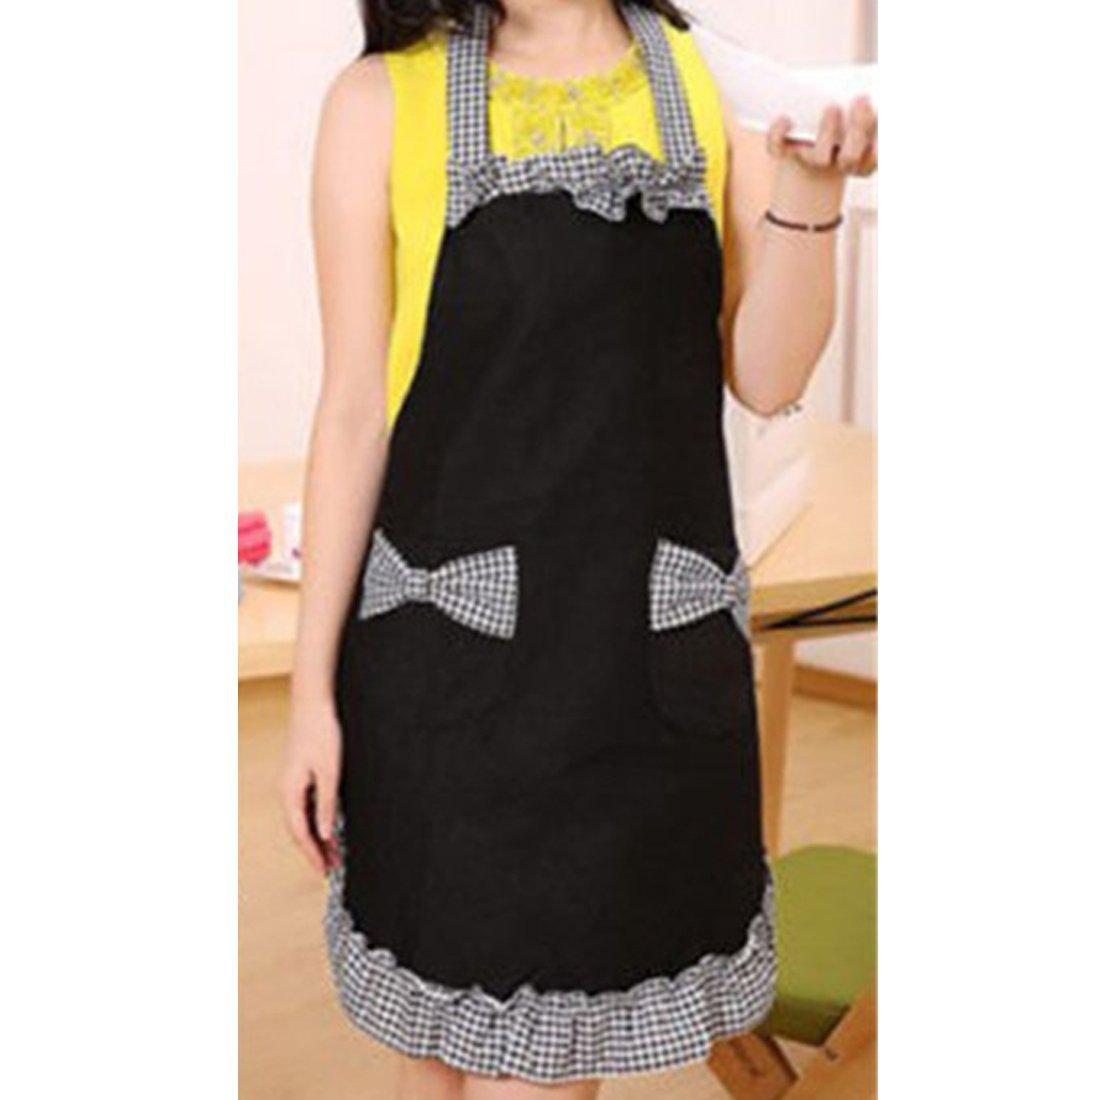 New 2016 Cute Bib Apron Dress Flirty Vintage Kitchen Women Bowknot With Pocket Gift 1